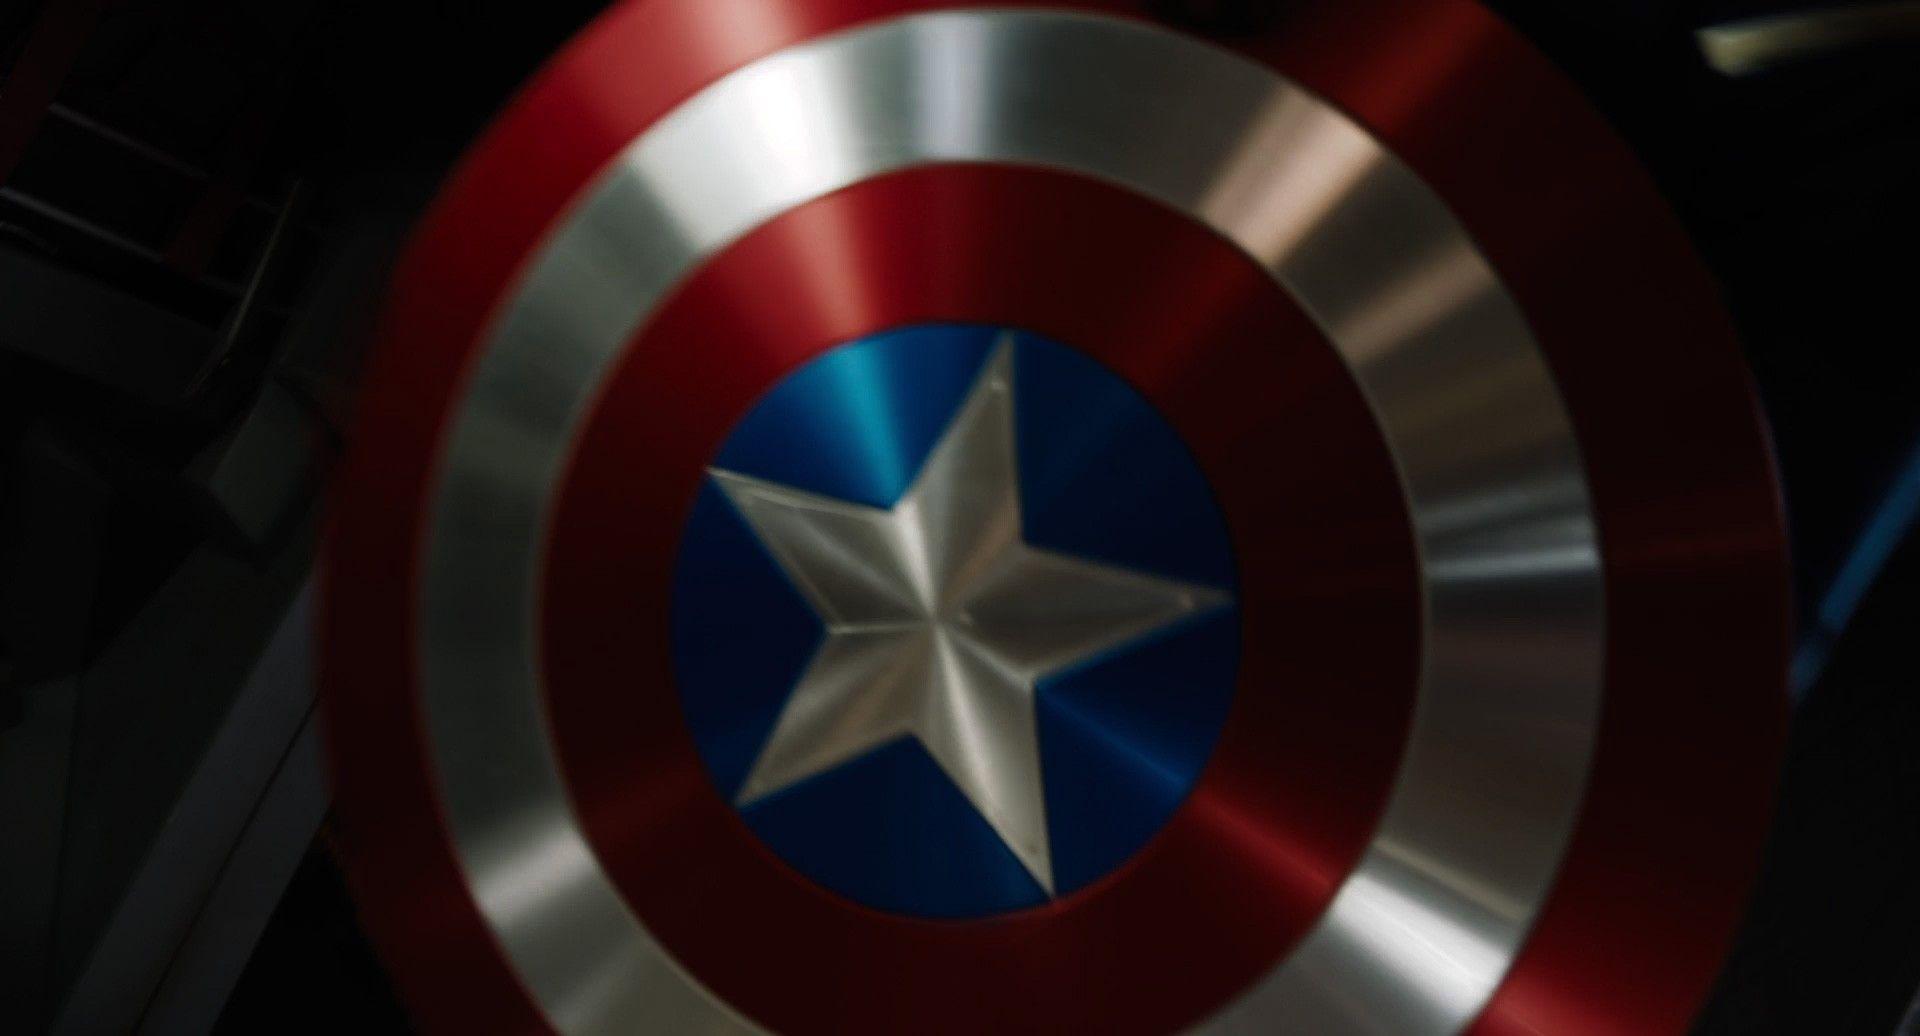 Captain America Wallpapers Free - Myomlife.com